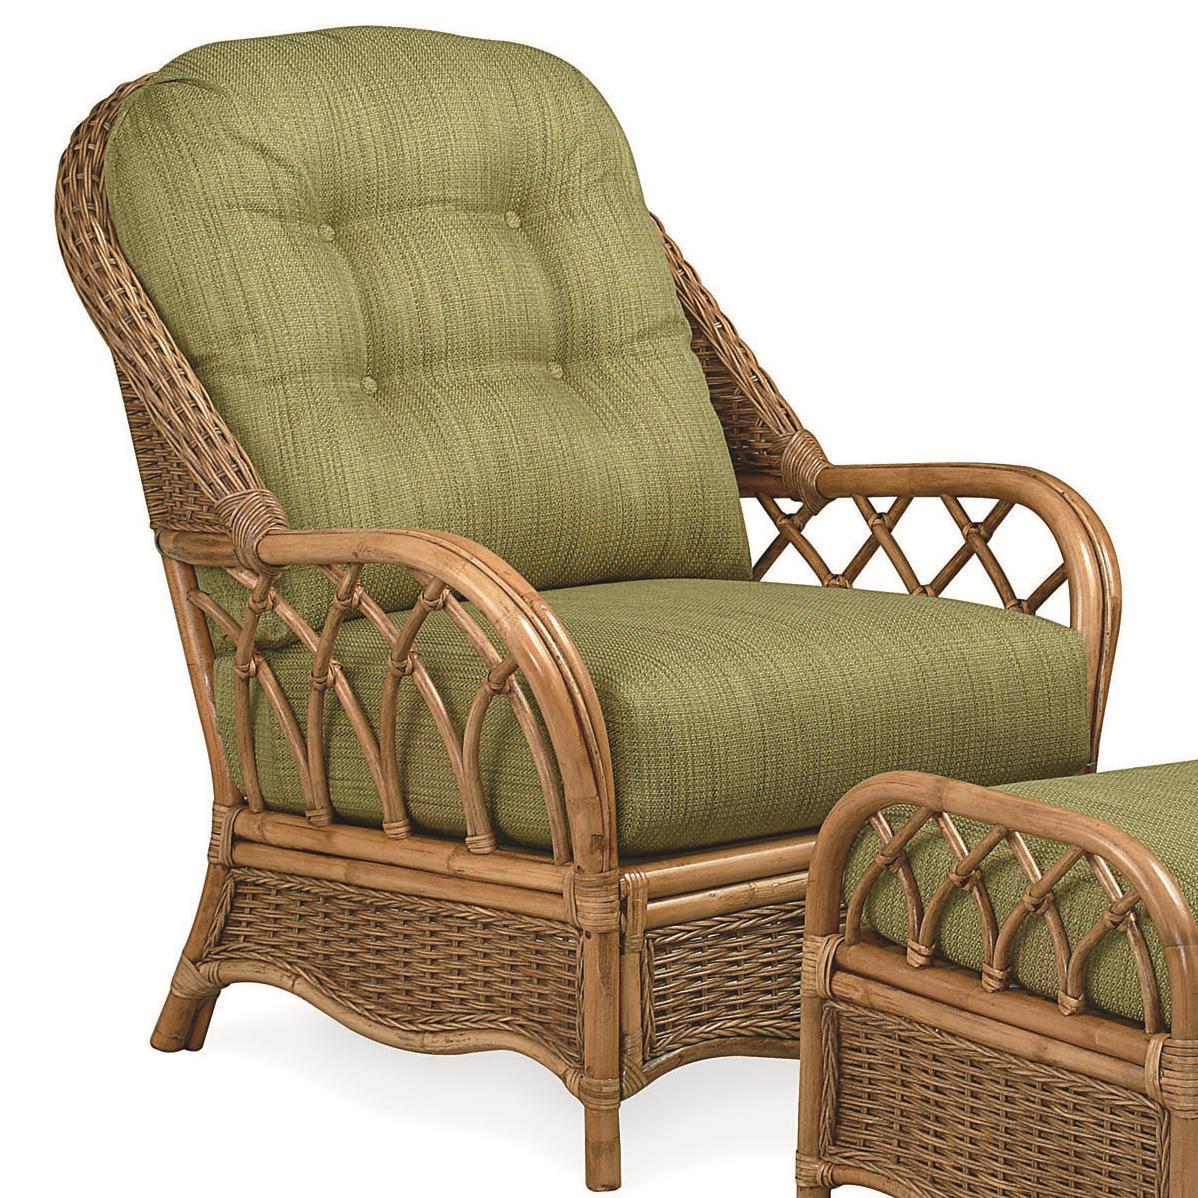 Bamboo Chair Rate: Braxton Culler Everglade Rattan Chair